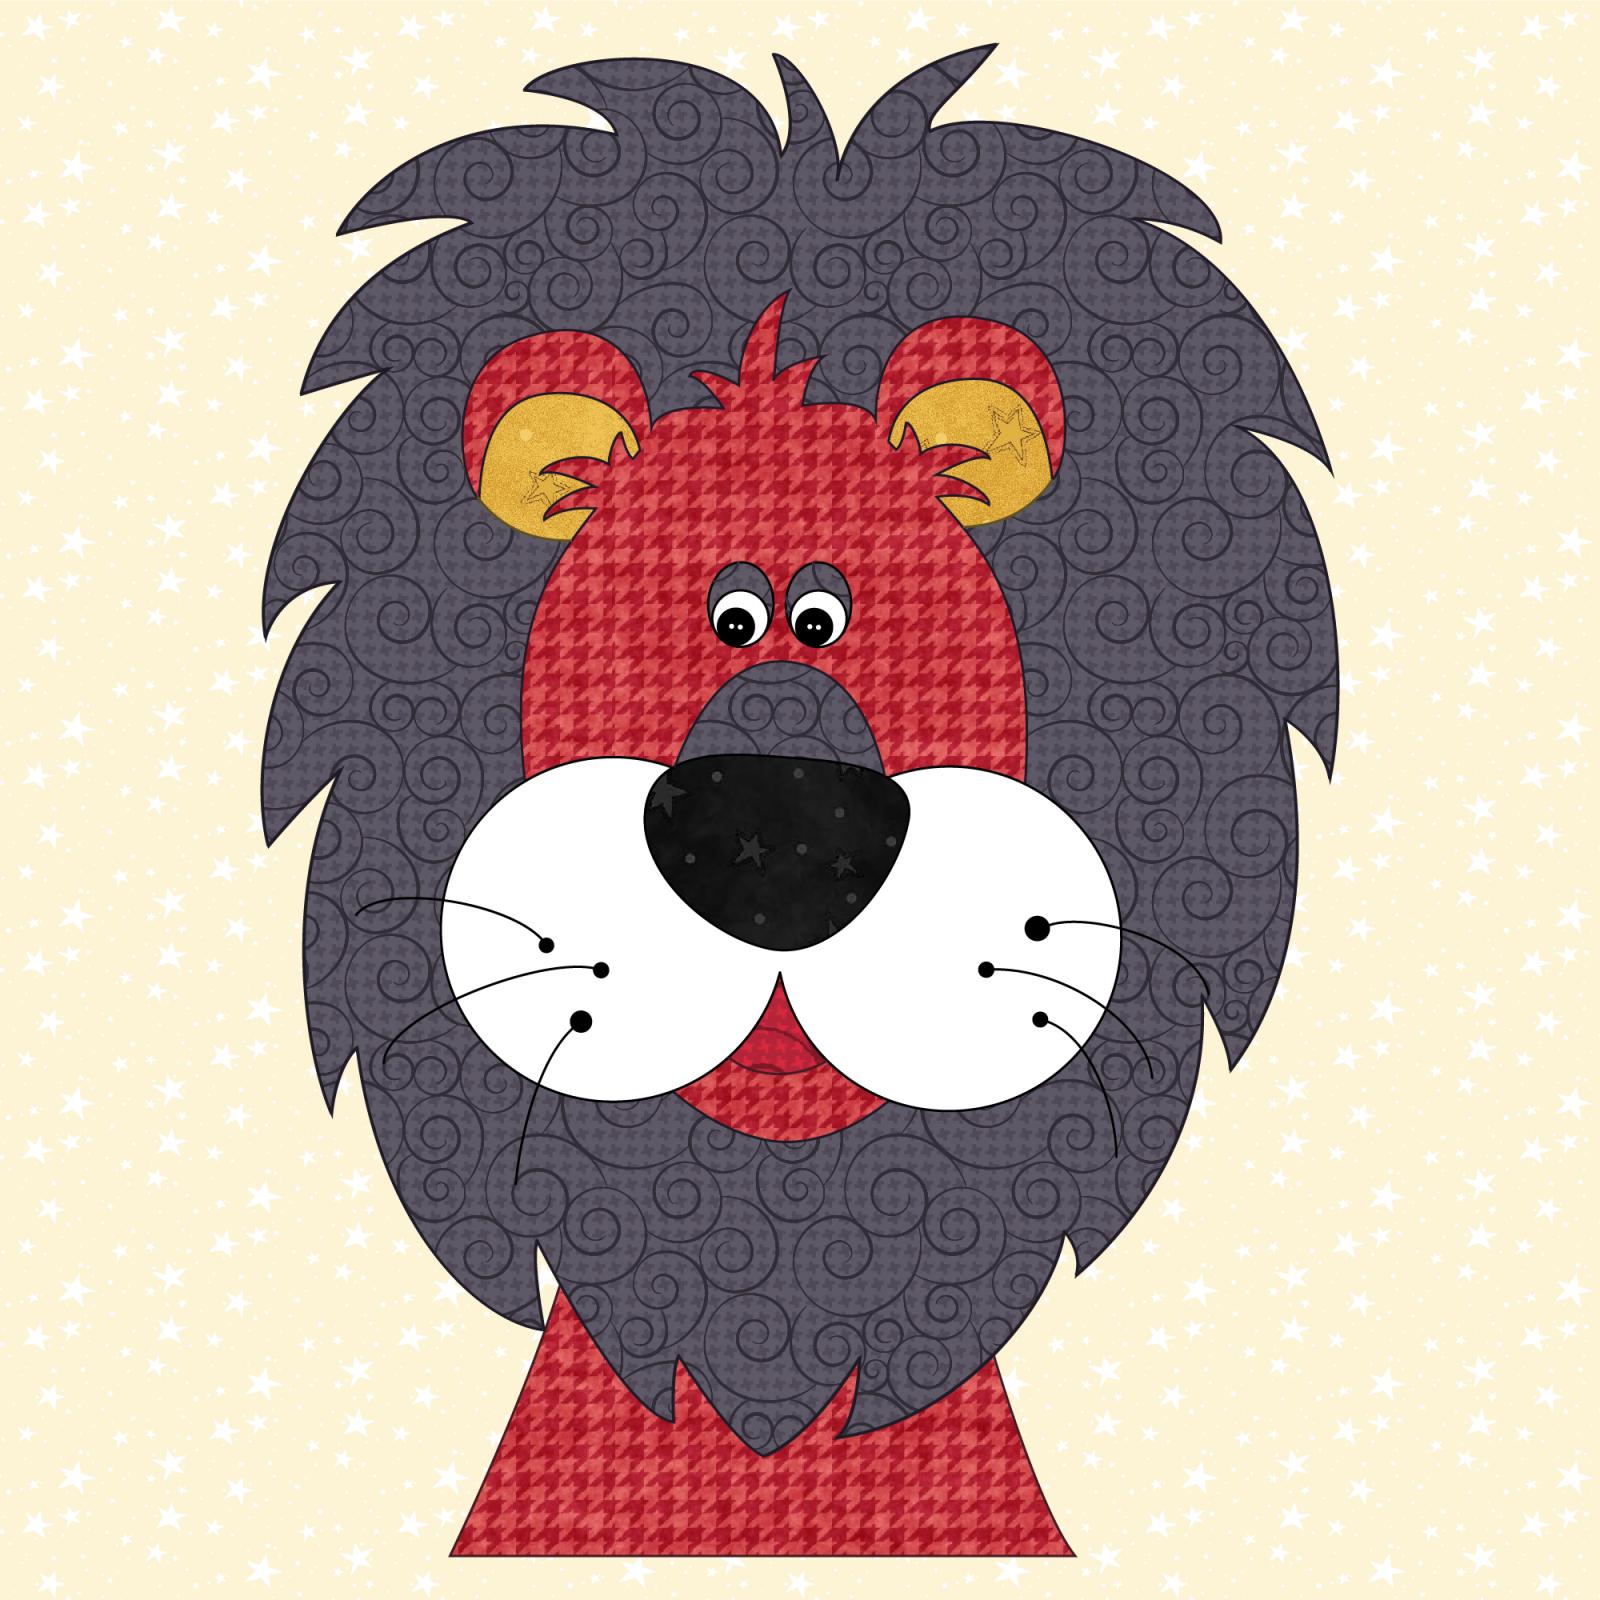 Lion Precut Prefused Applique Kit